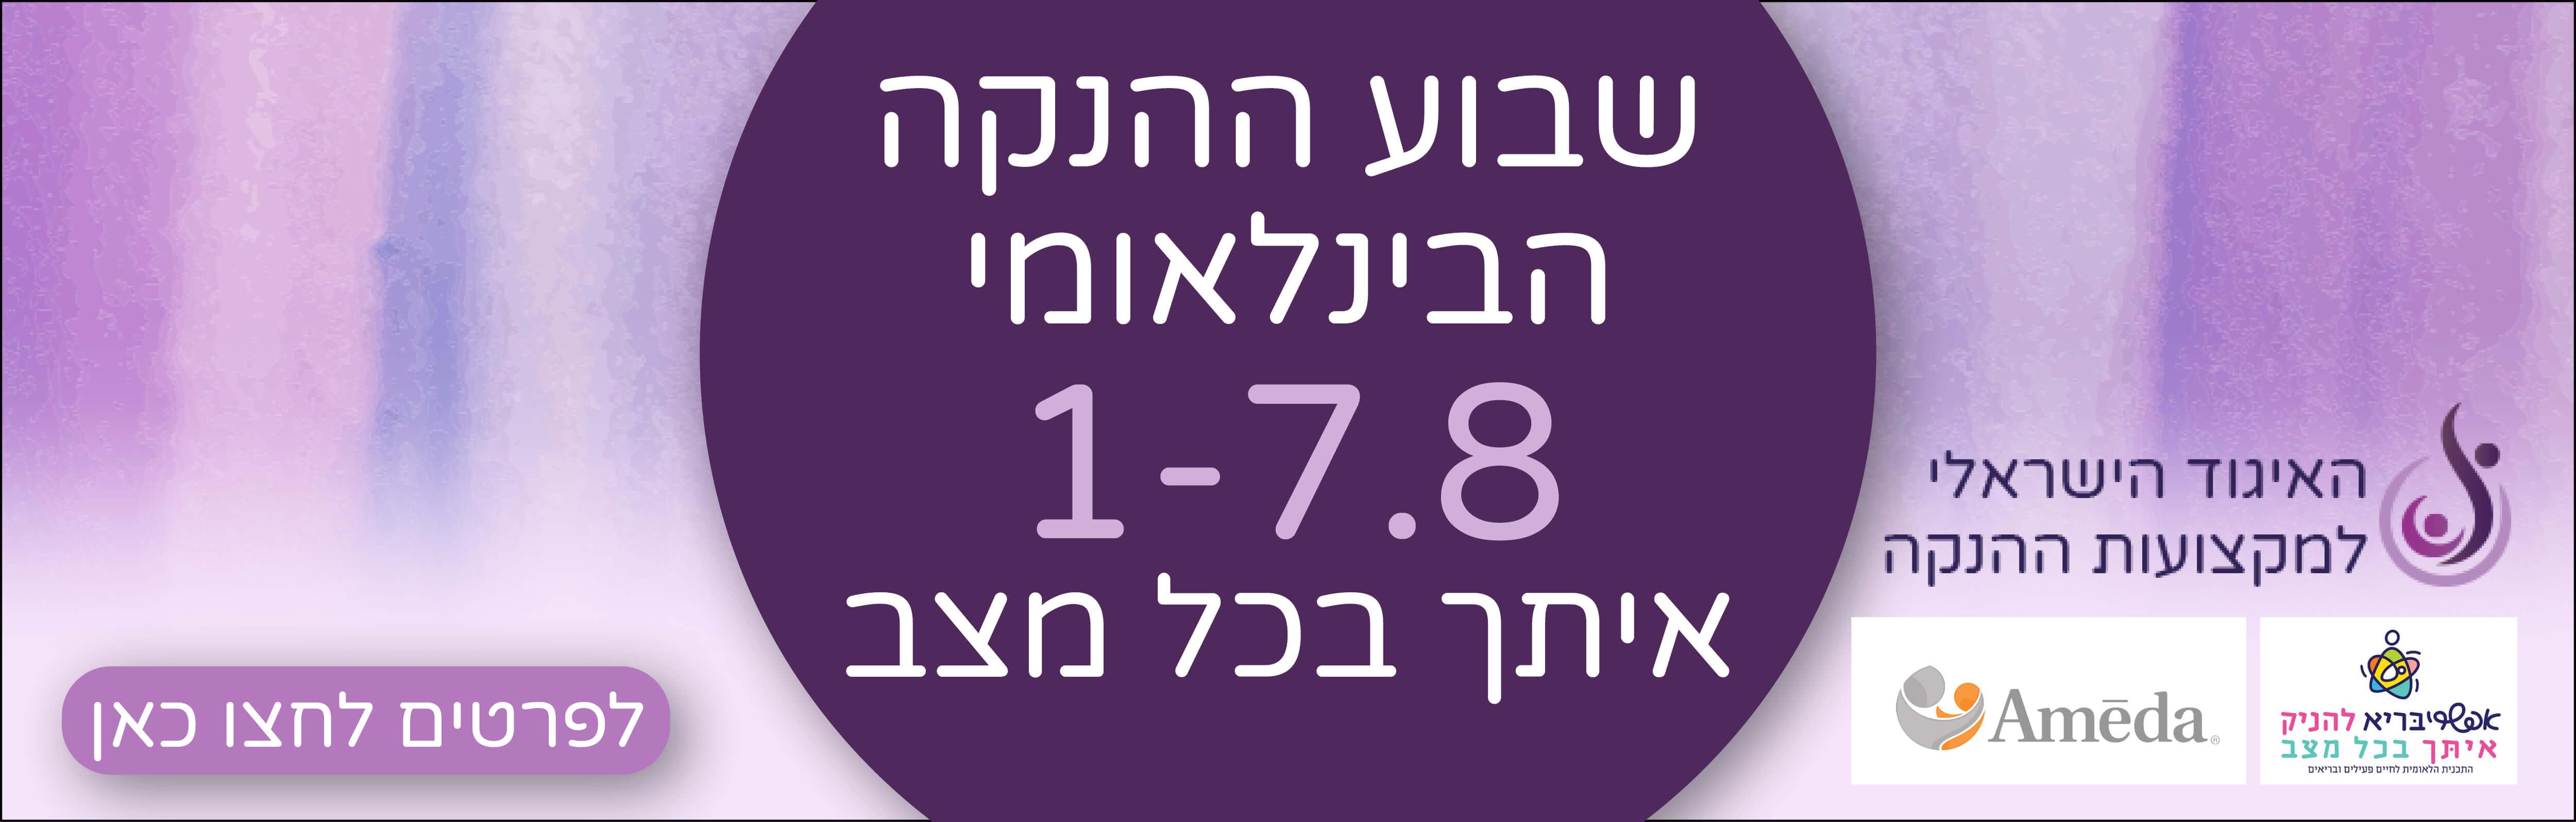 banner aug2021 4